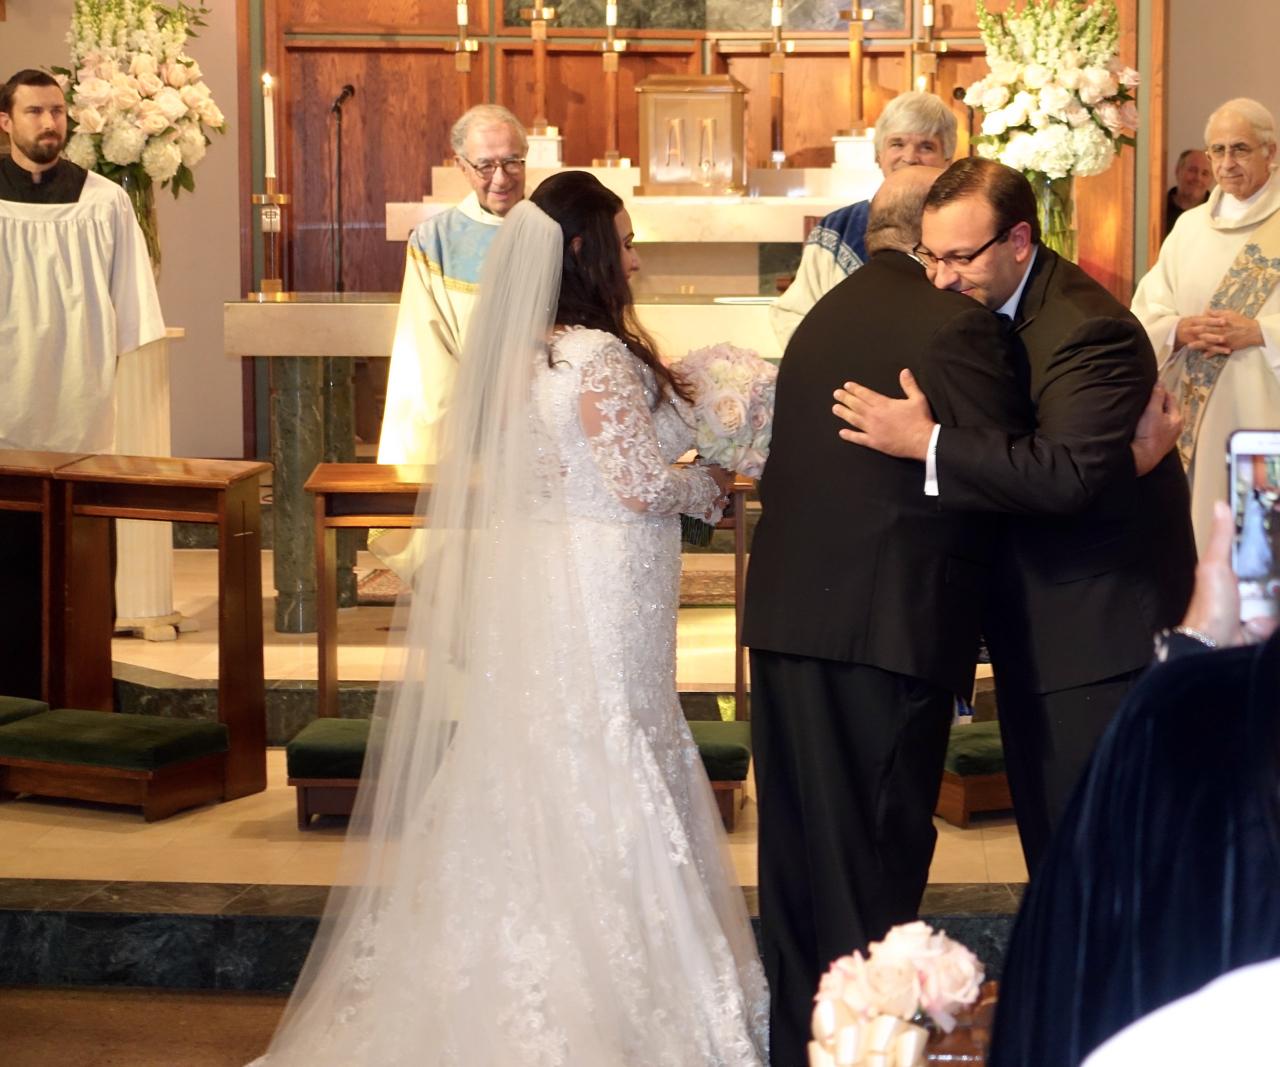 chrissy-and-robs-wedding_30839219425_o